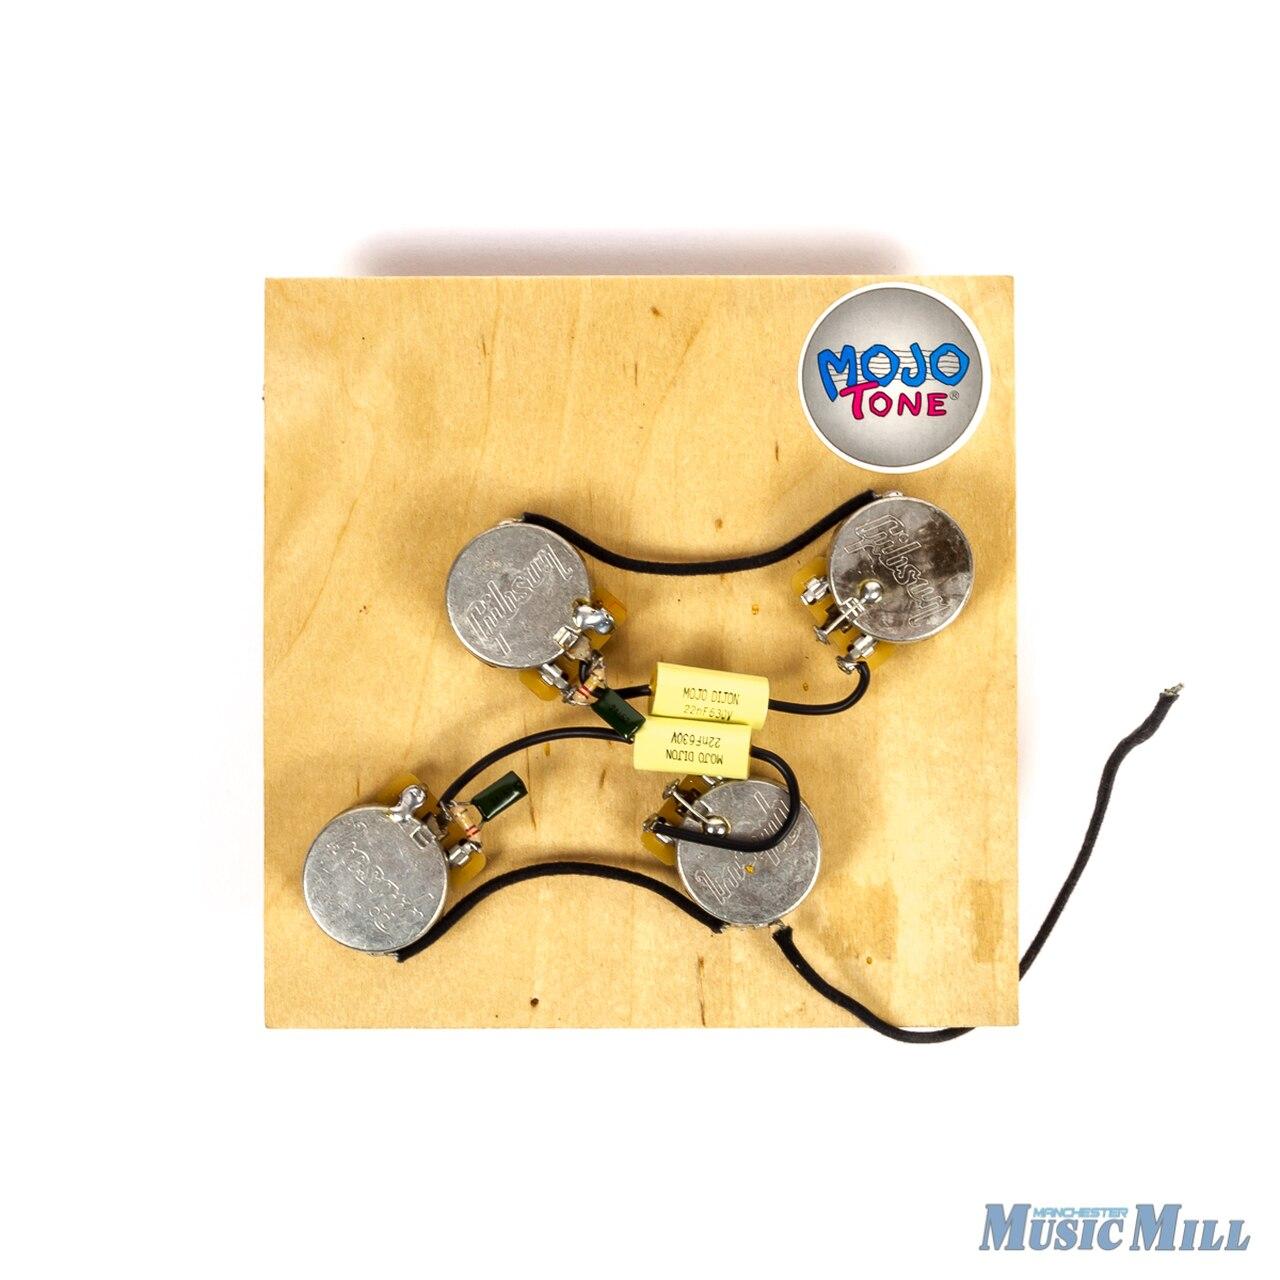 gibson wiring harness sf 1020  gibson wiring harness gibson sg wiring harness sf 1020  gibson wiring harness